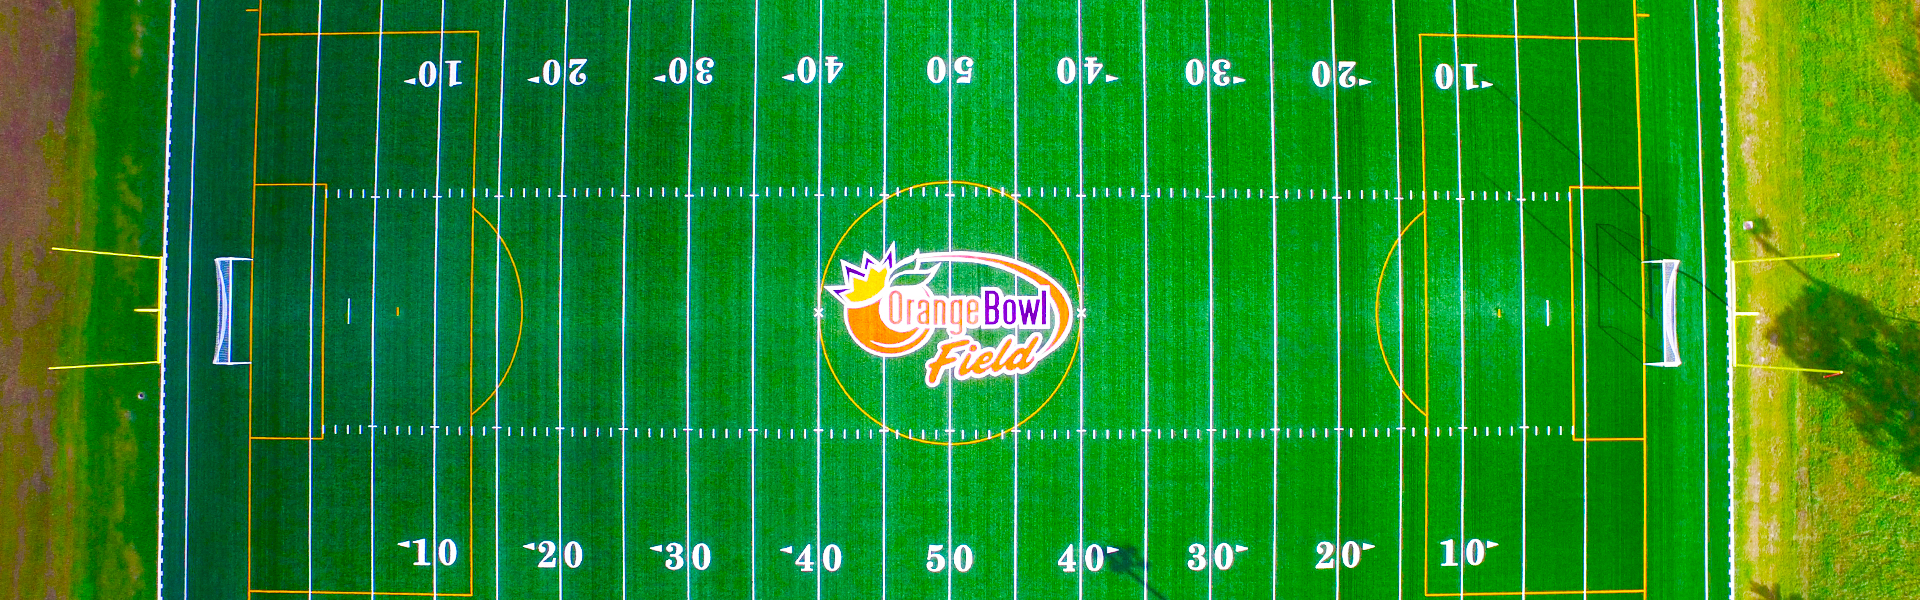 Orange Bowl Ives Estates Park - Legacy Gifts | Orange Bowl